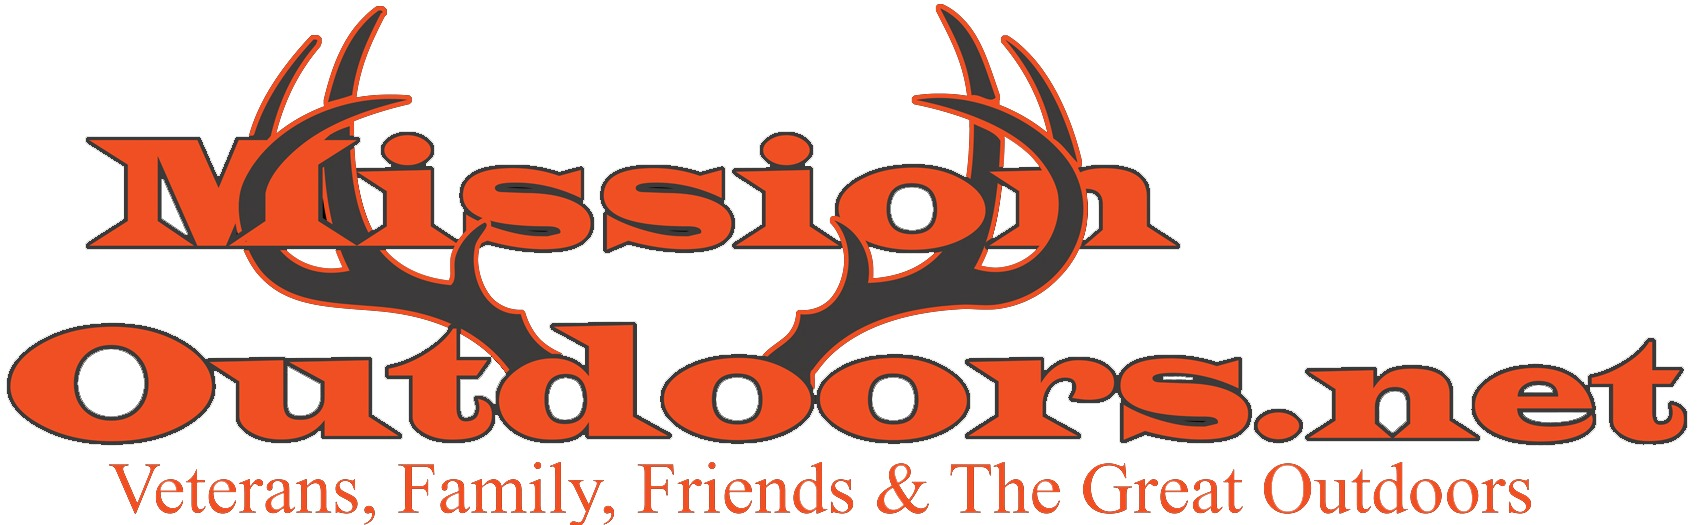 MissionOutdoors.net